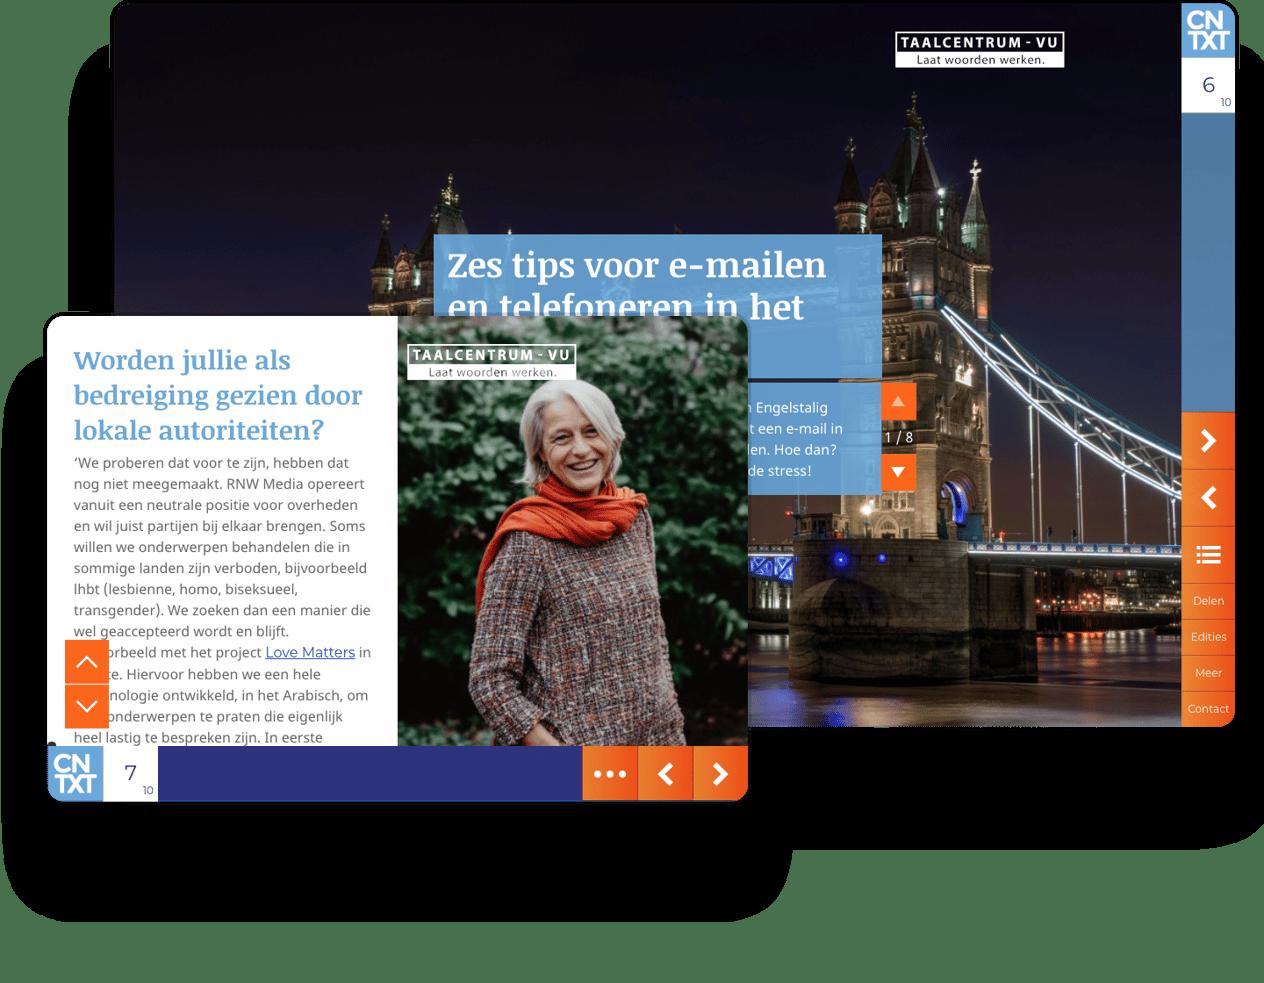 Interactive newsletter example